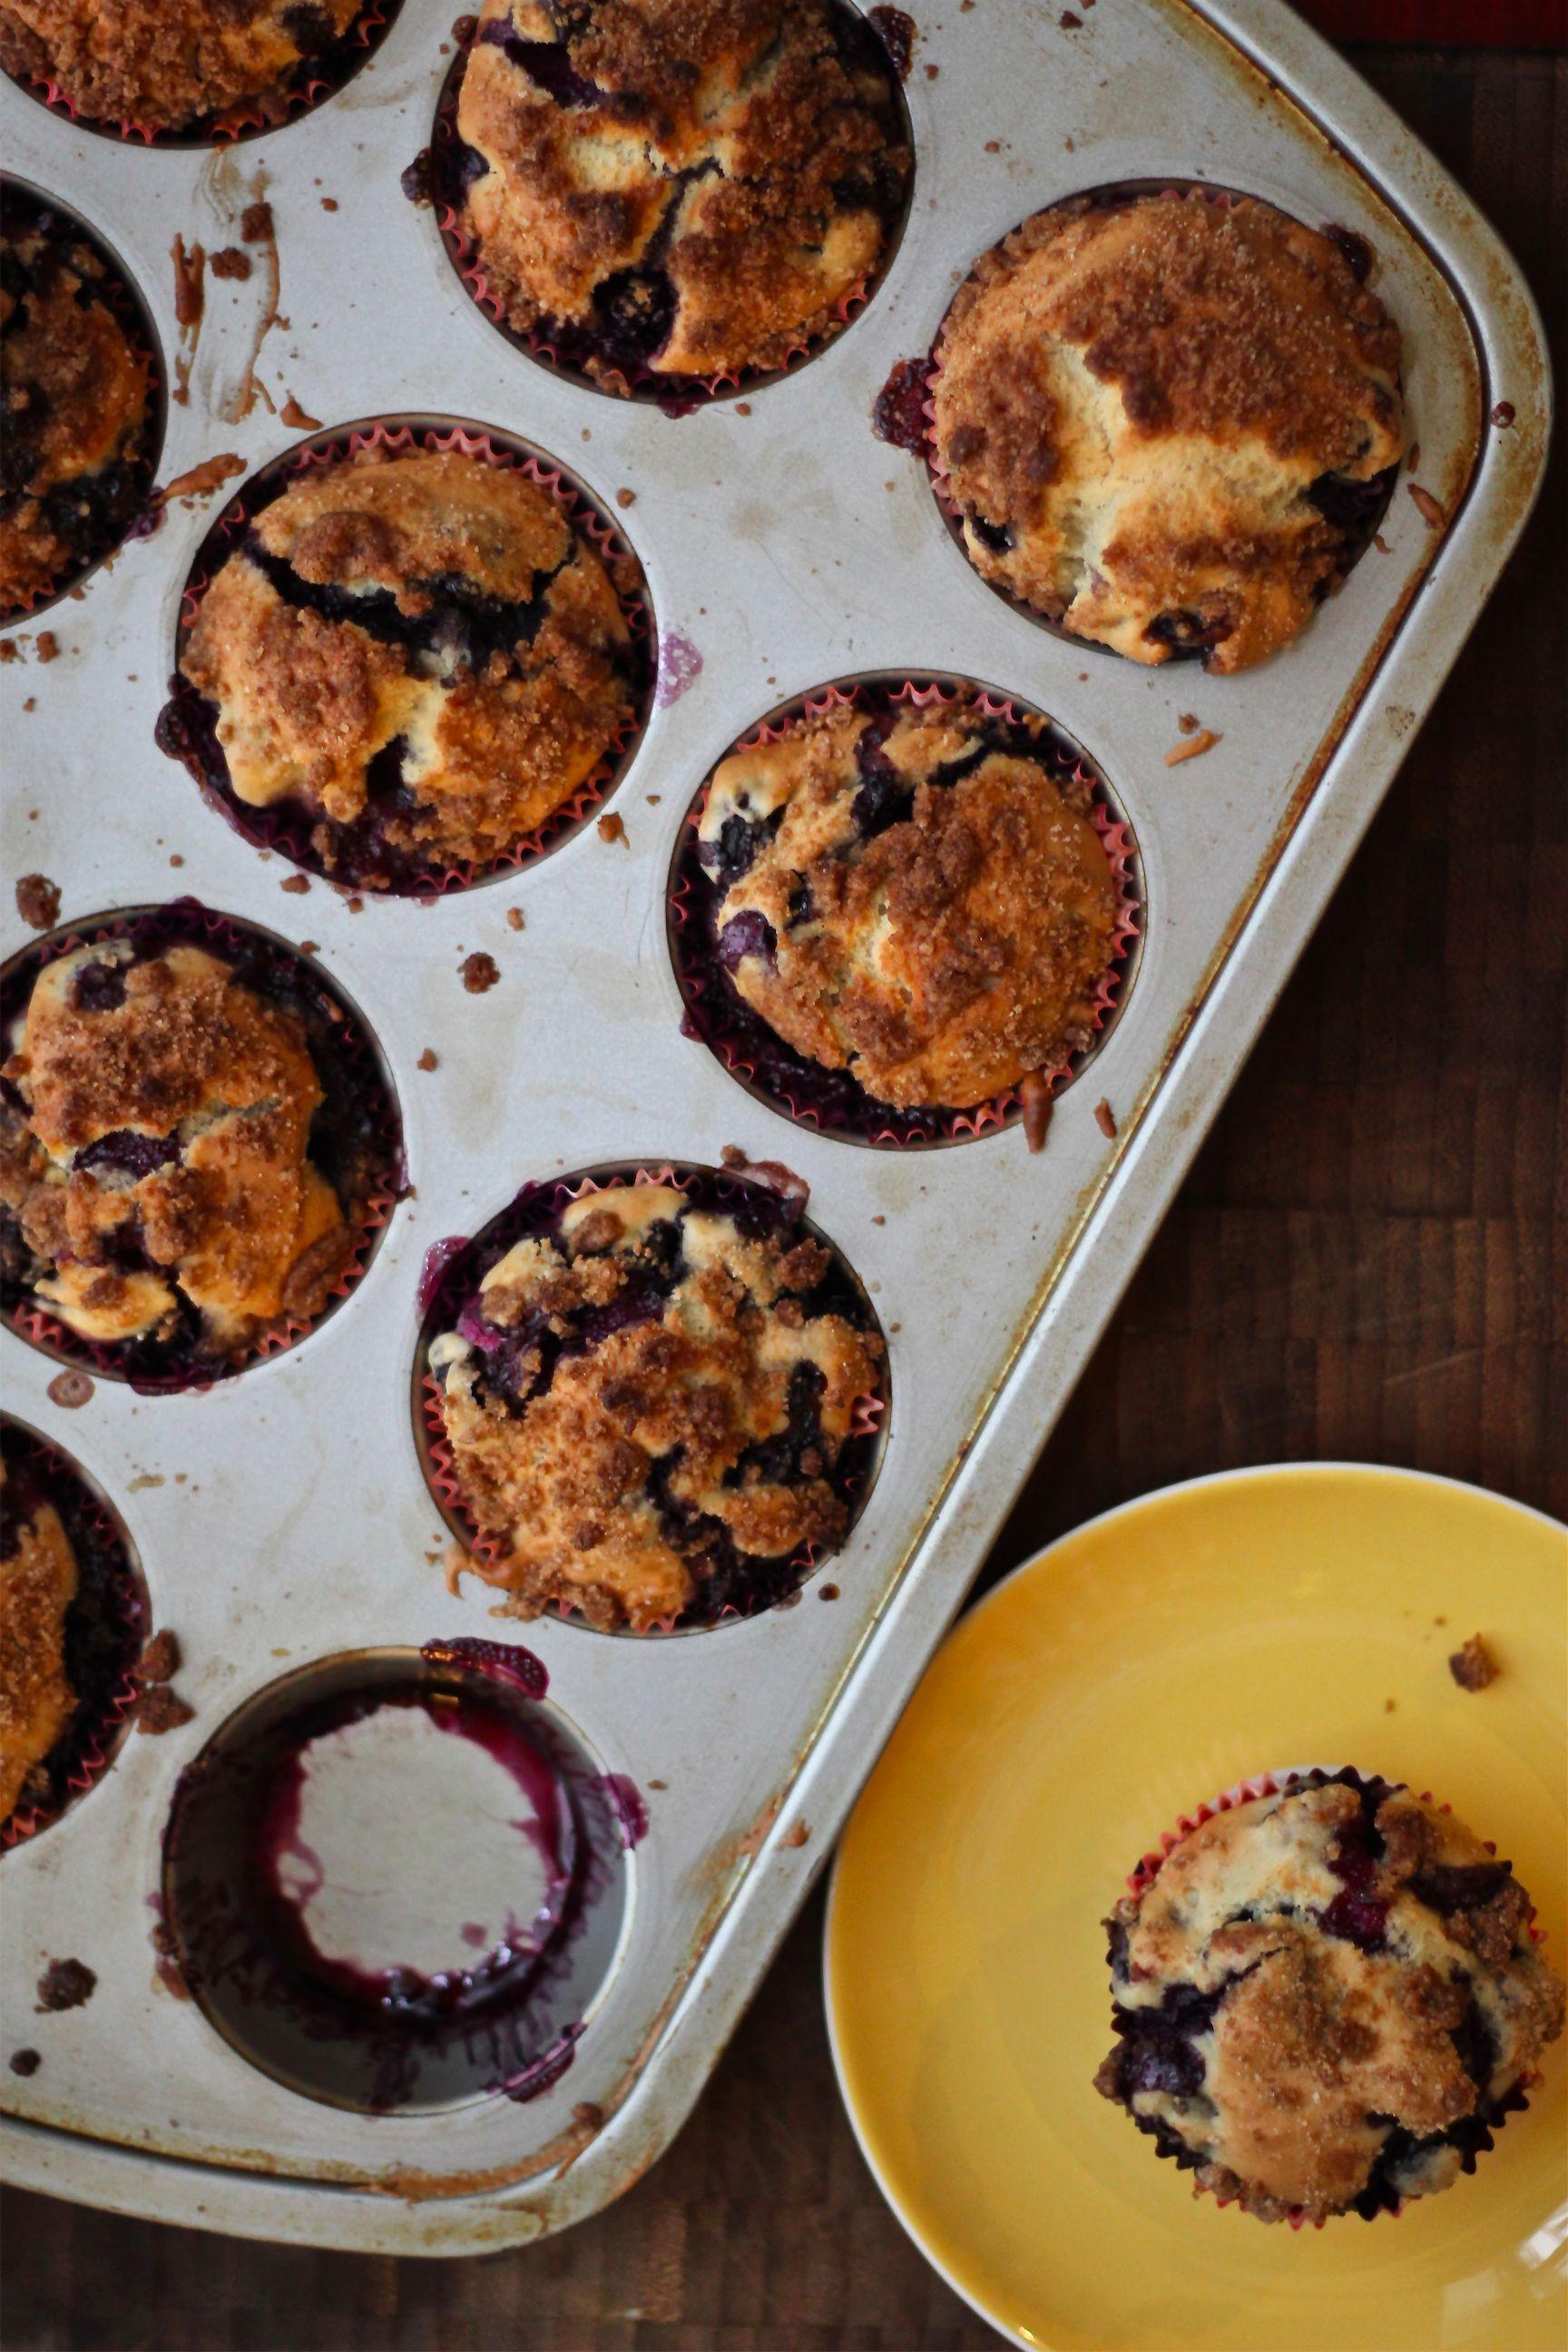 Betty crocker blueberry muffin mix coffee cake recipe